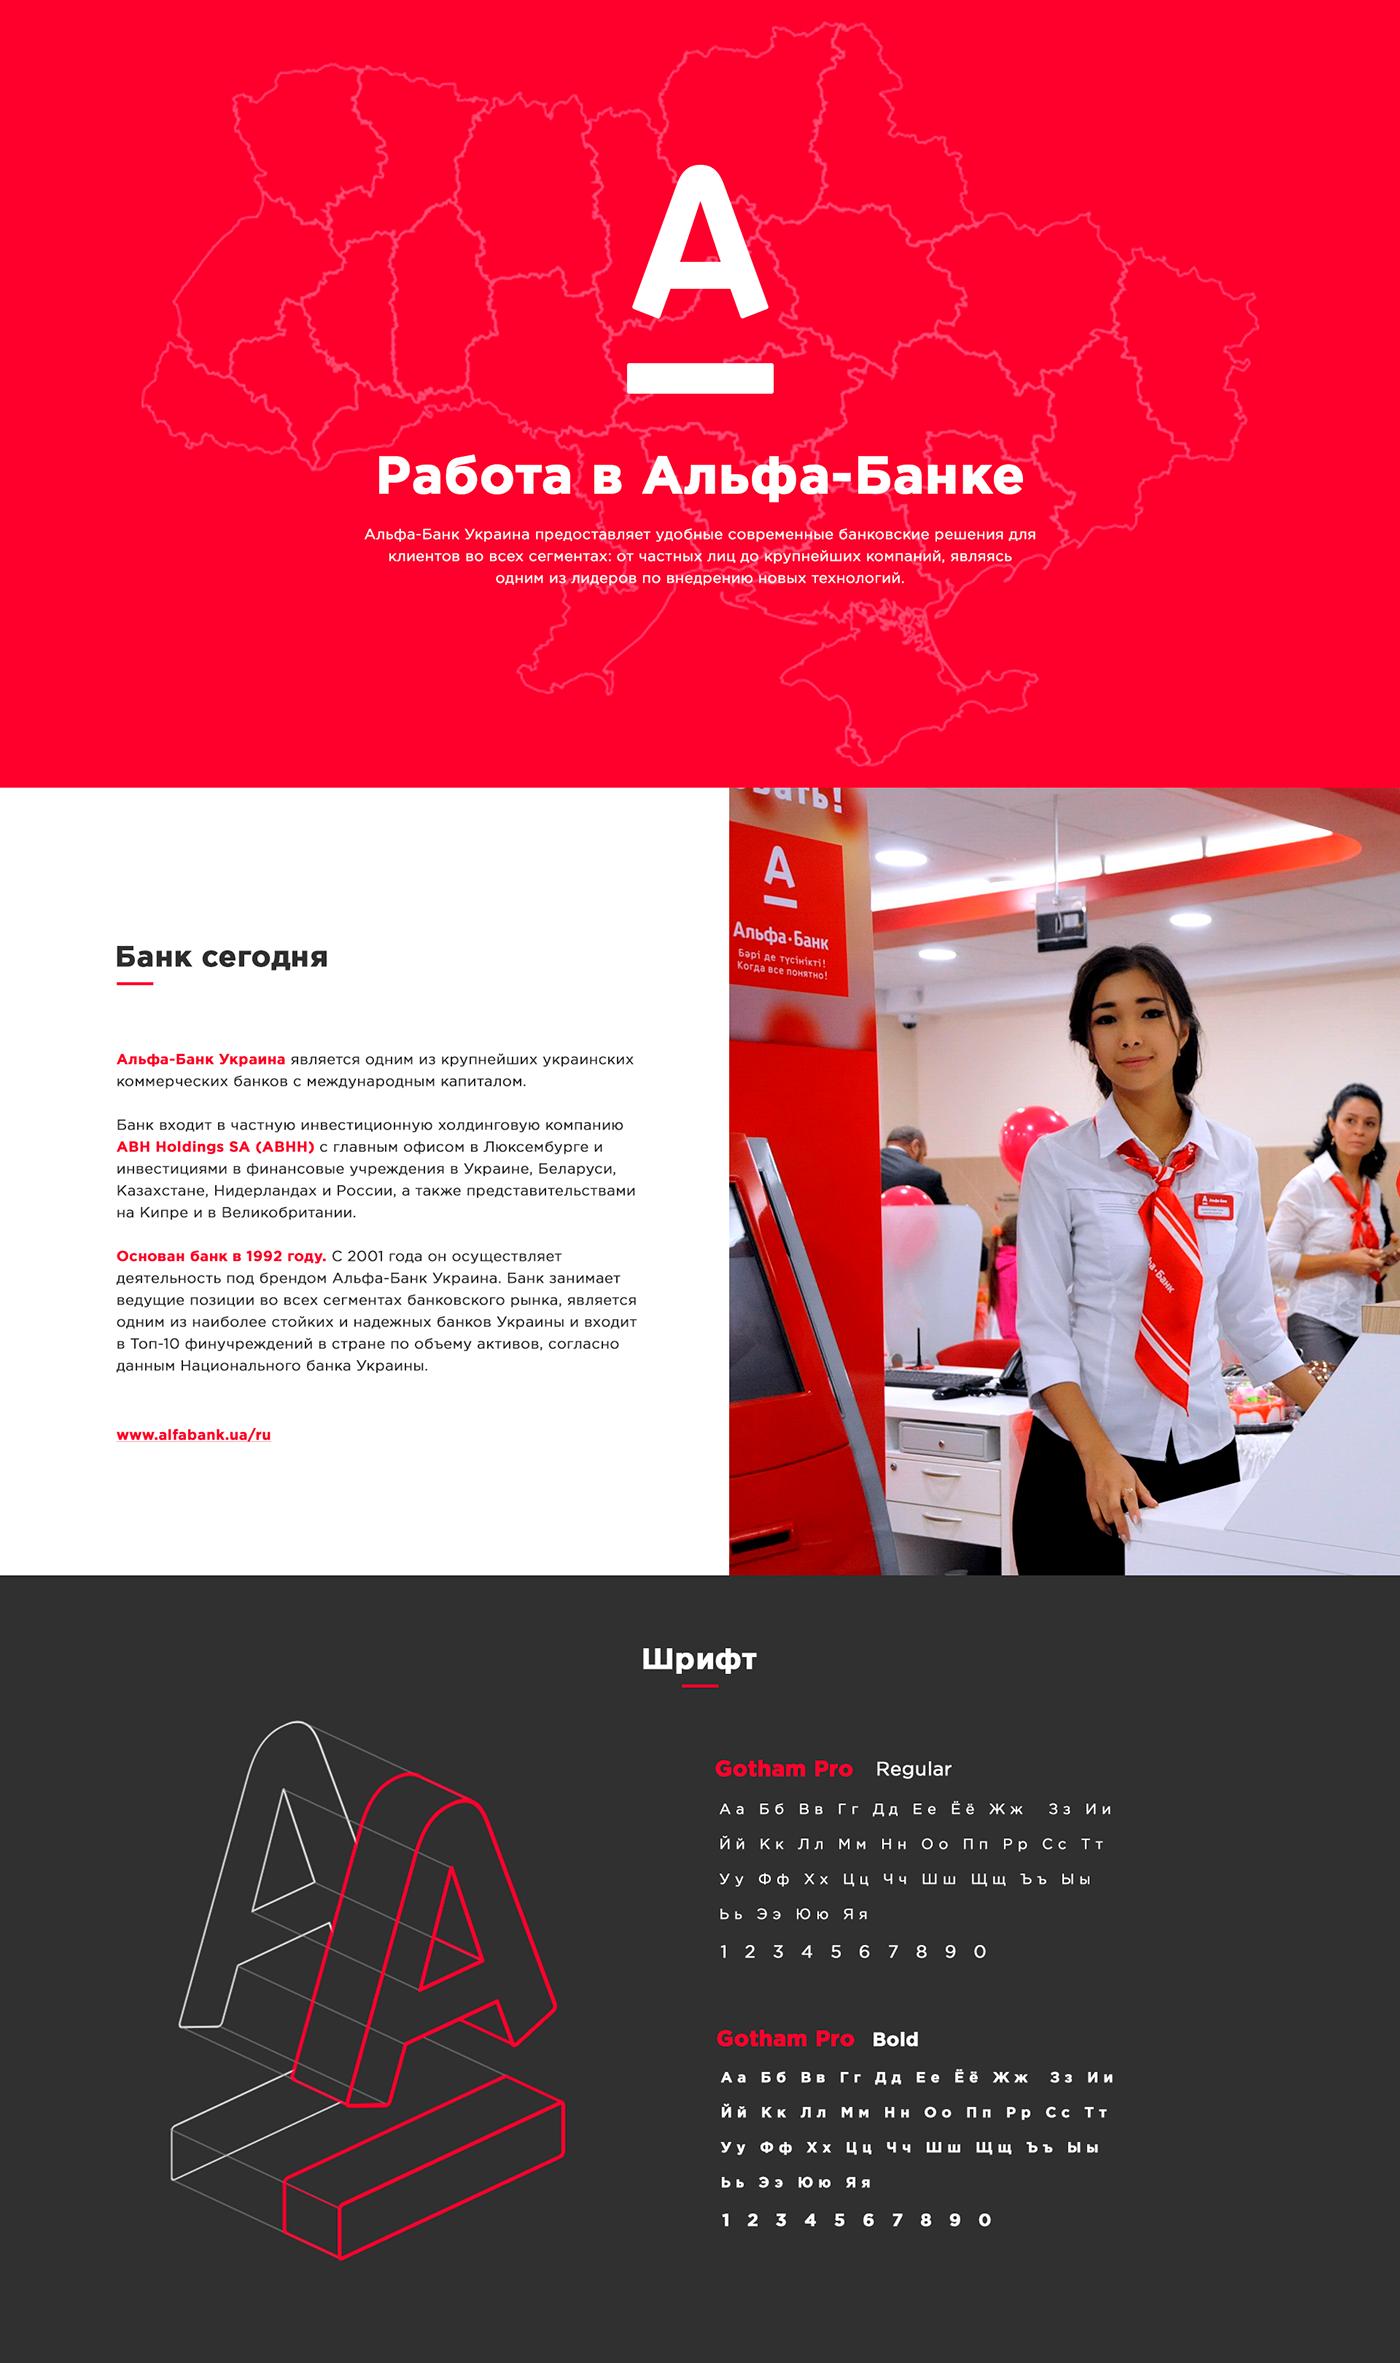 alfa-bank web-design UI/UX vis-a-vis eychar site Interface banking vacancy finance